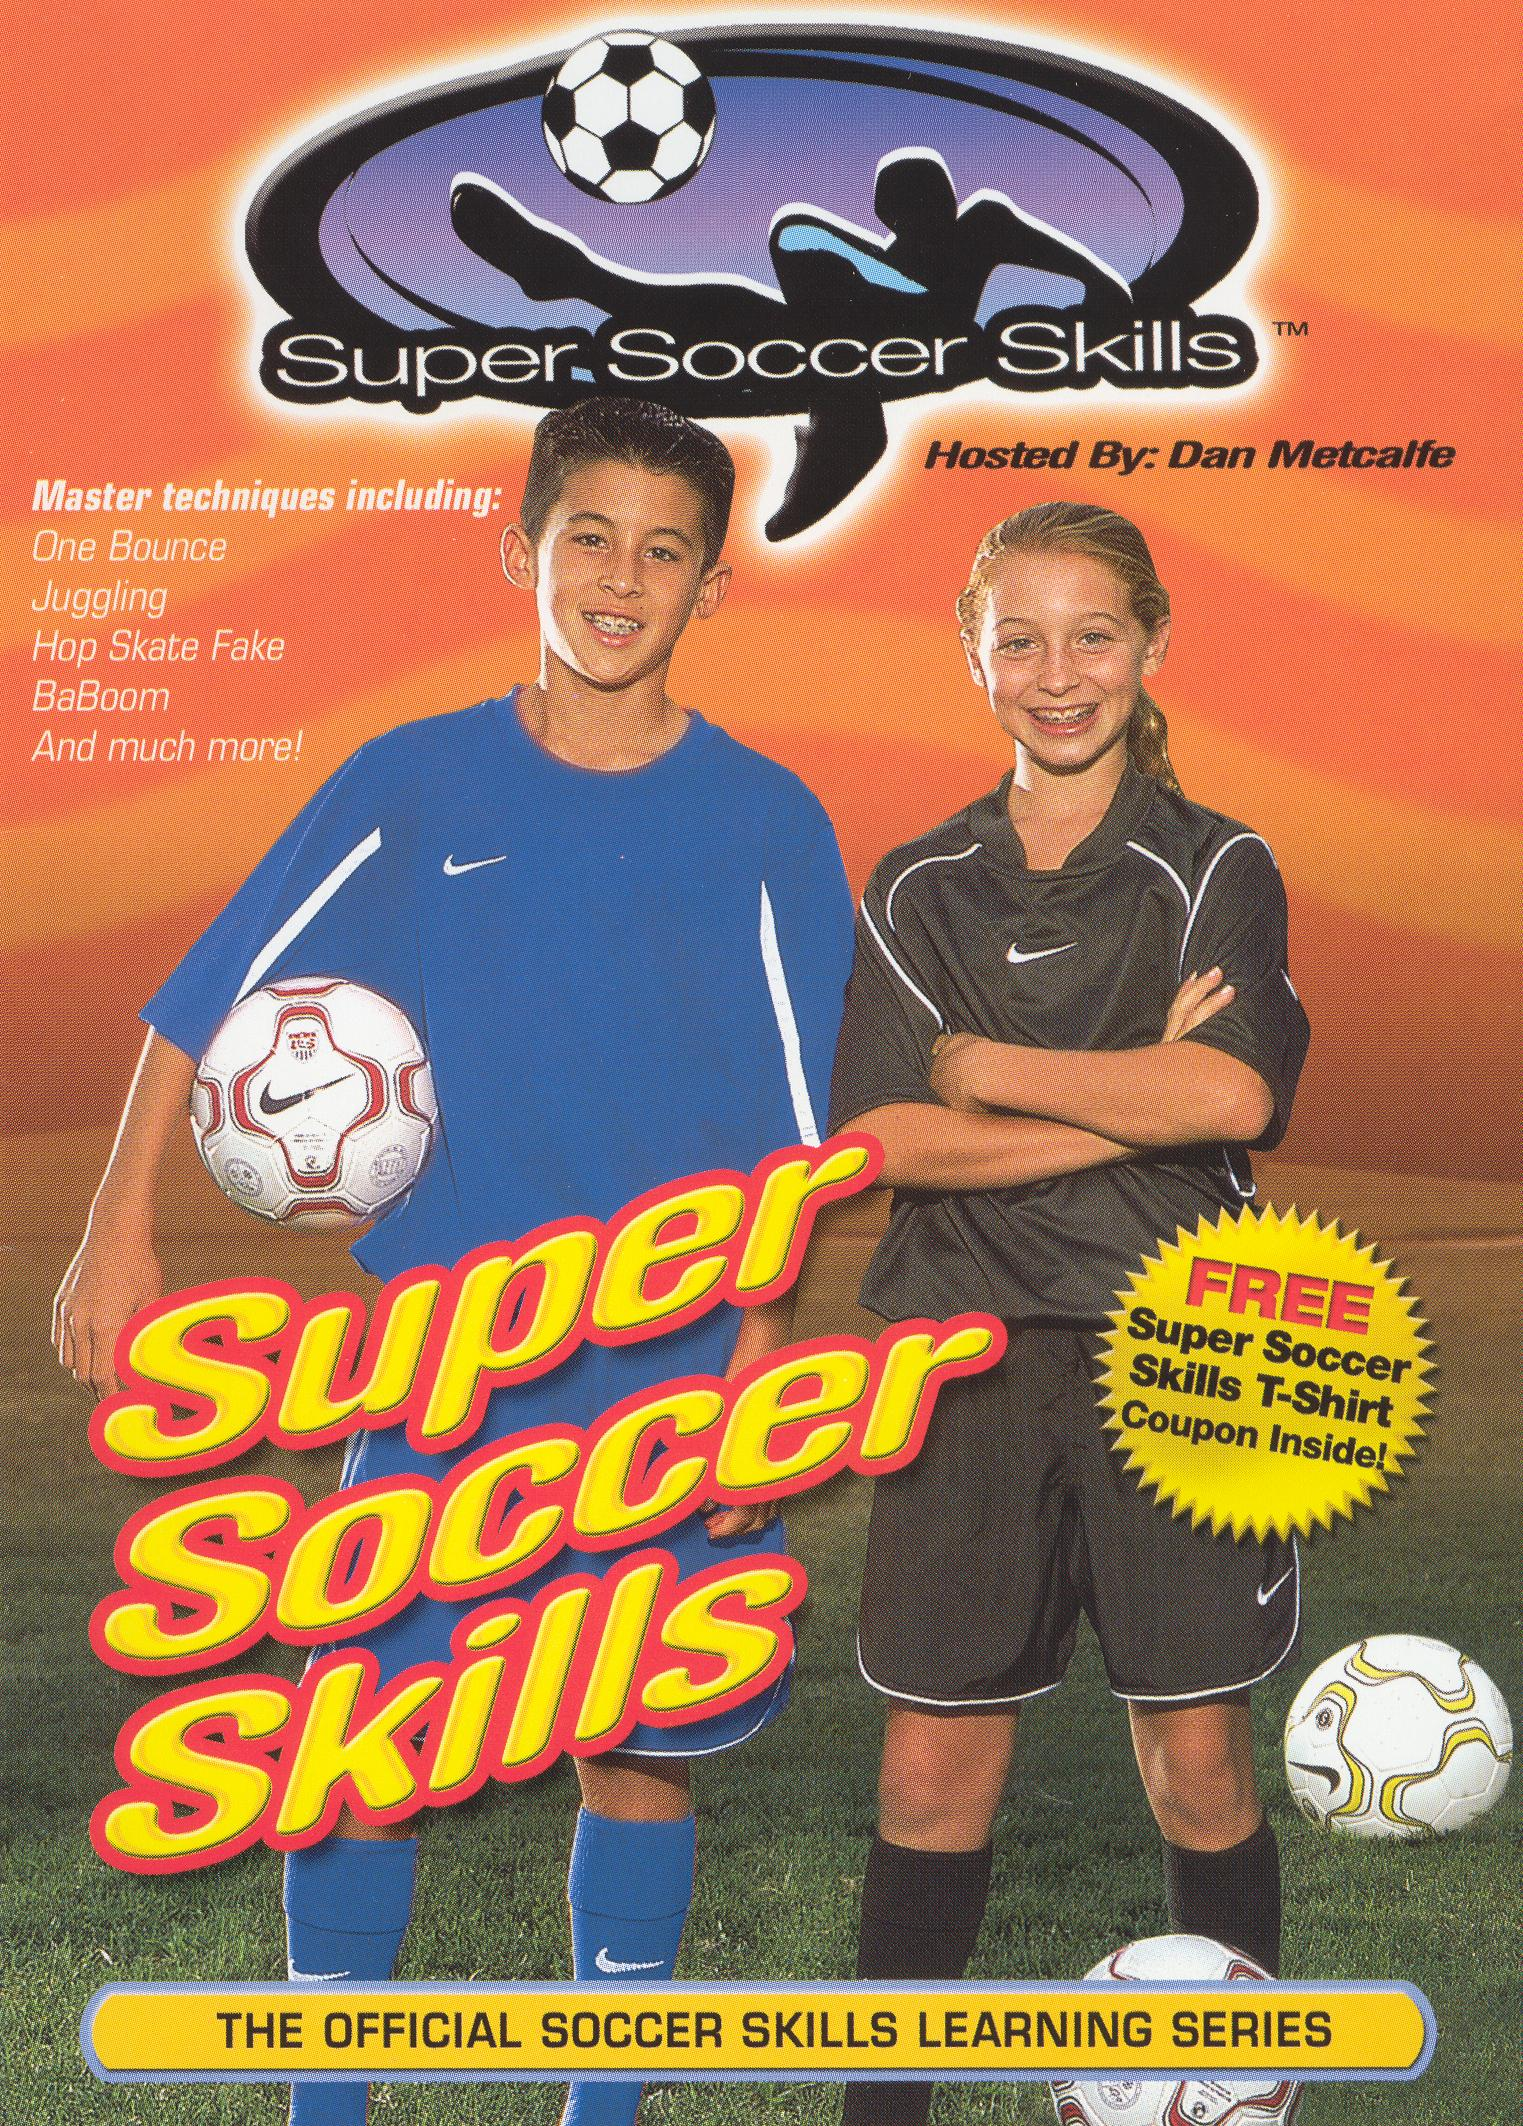 Super Soccer Skills